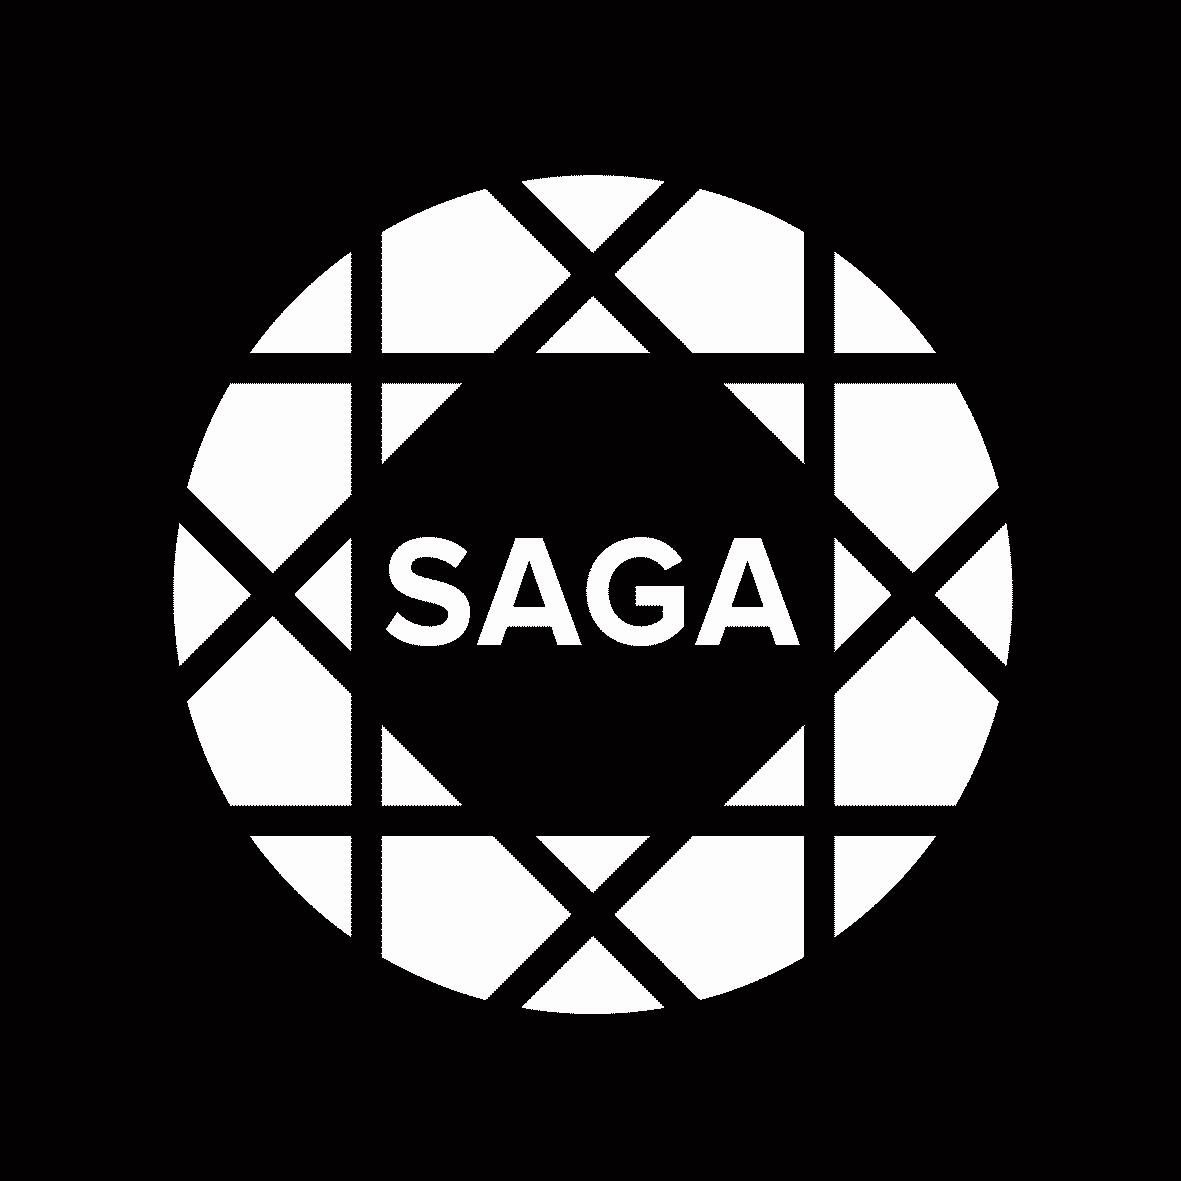 Saga Film Festival